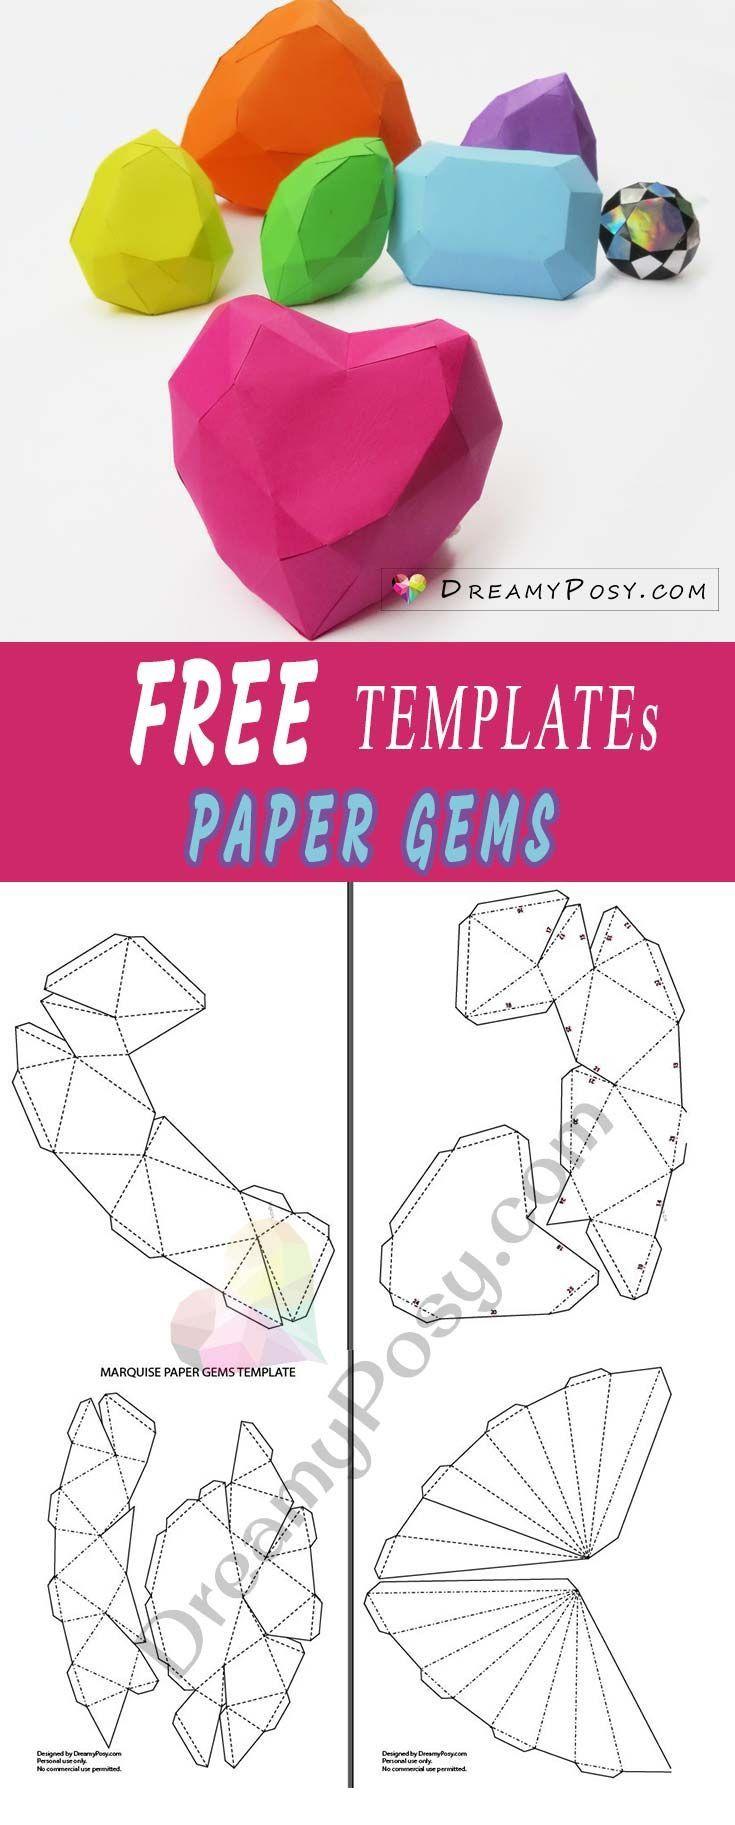 003 Magnificent 3d Paper Art Template Inspiration  Templates PdfFull